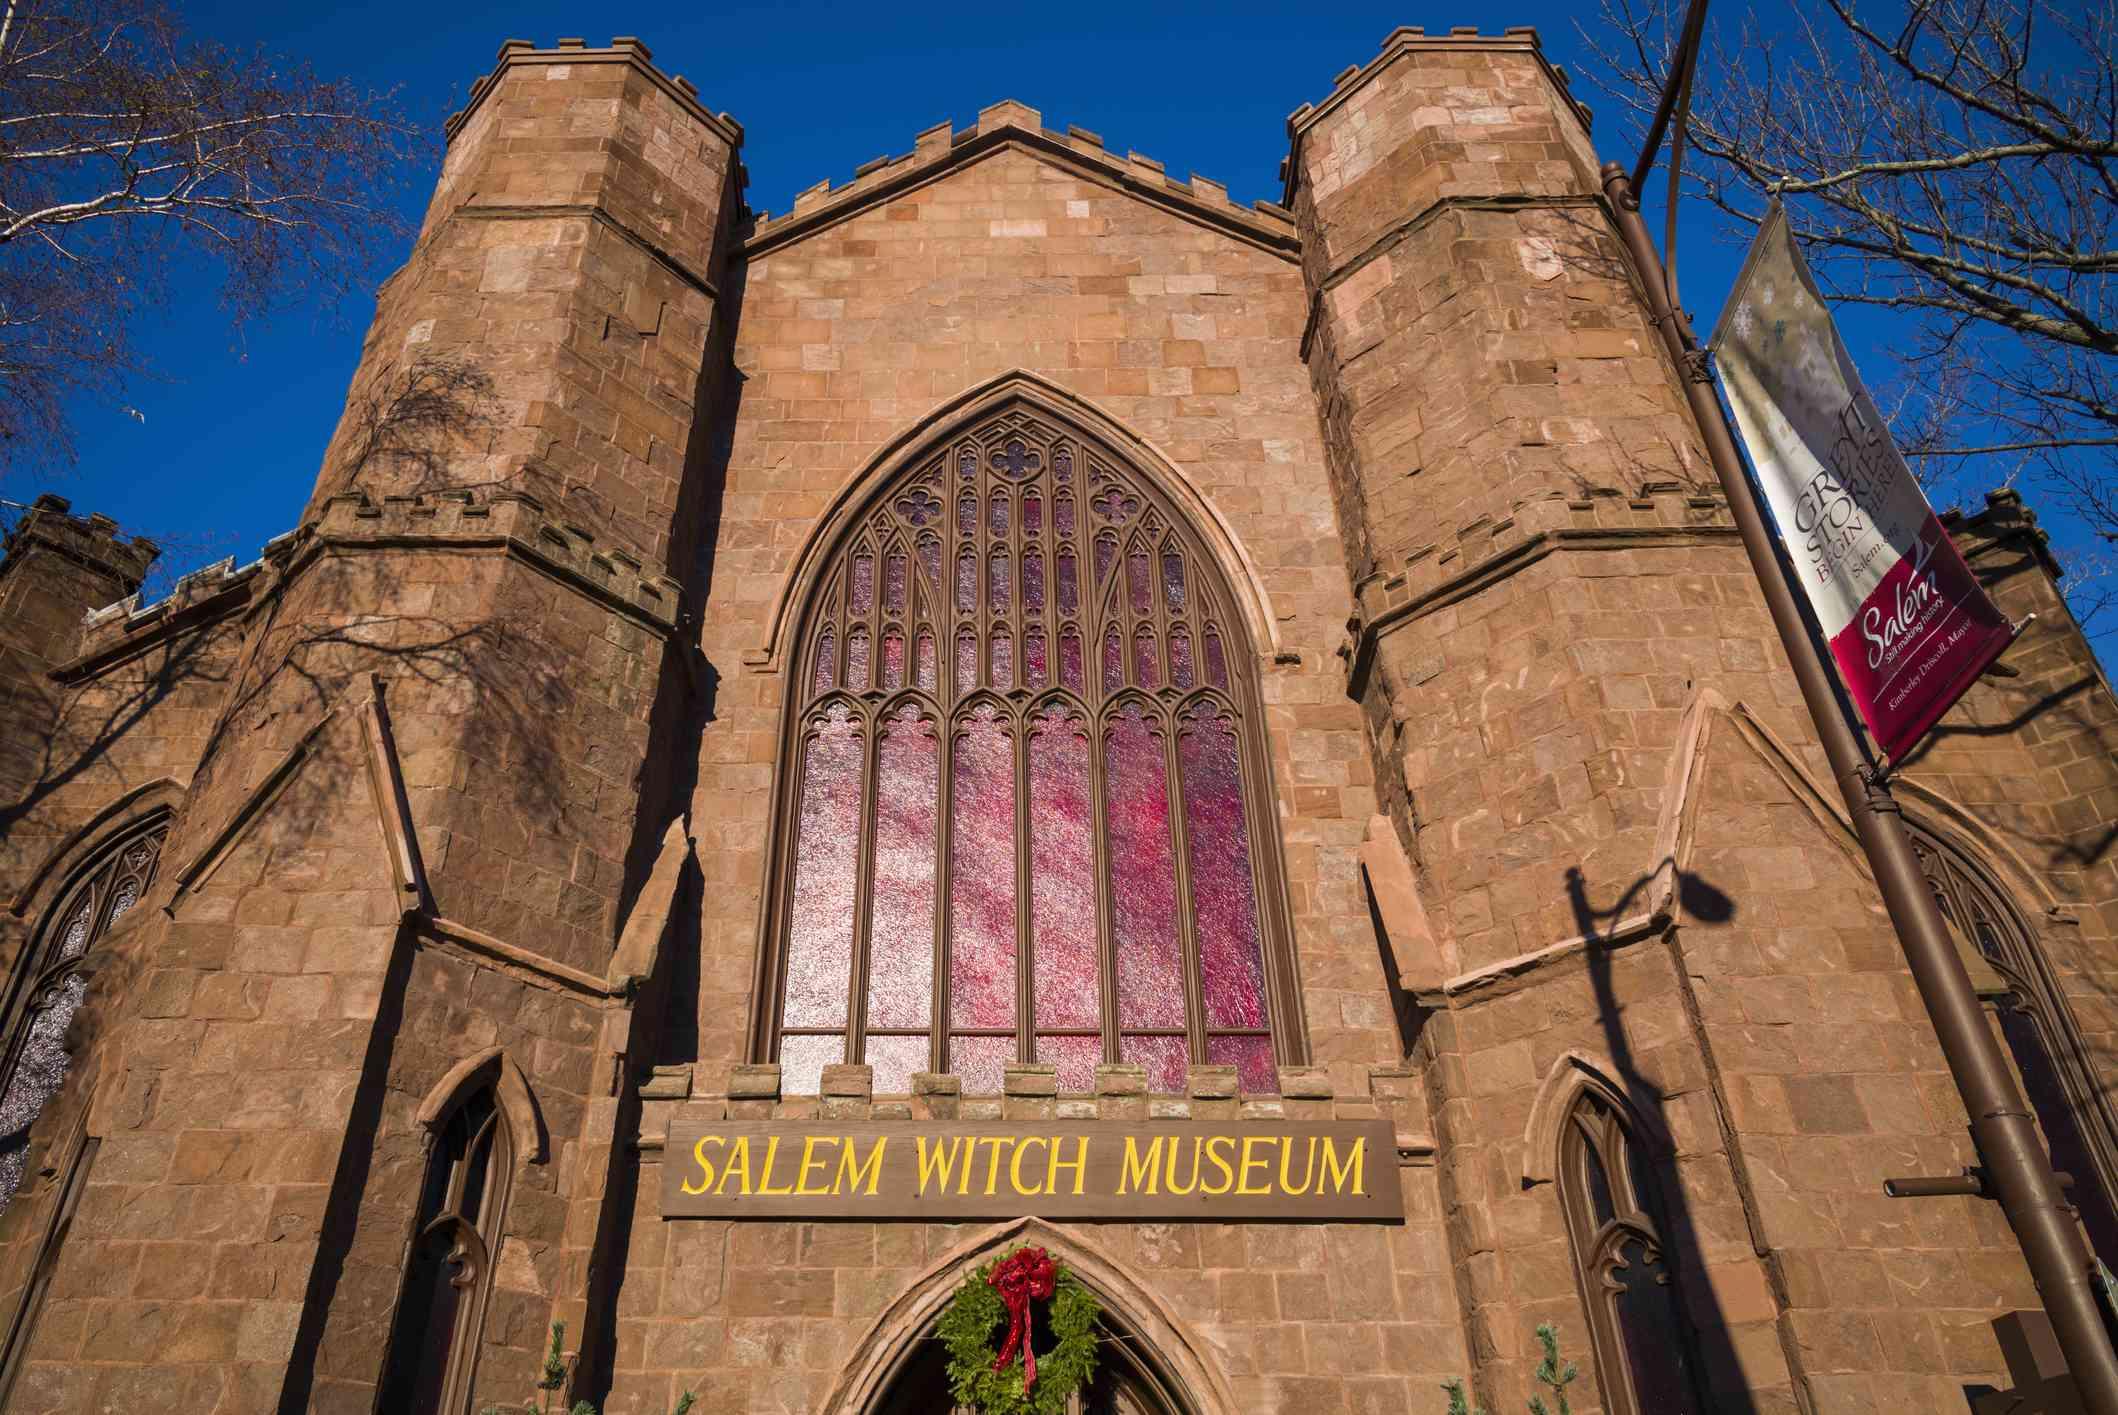 Salem Witch Museum in Salem Massachusetts